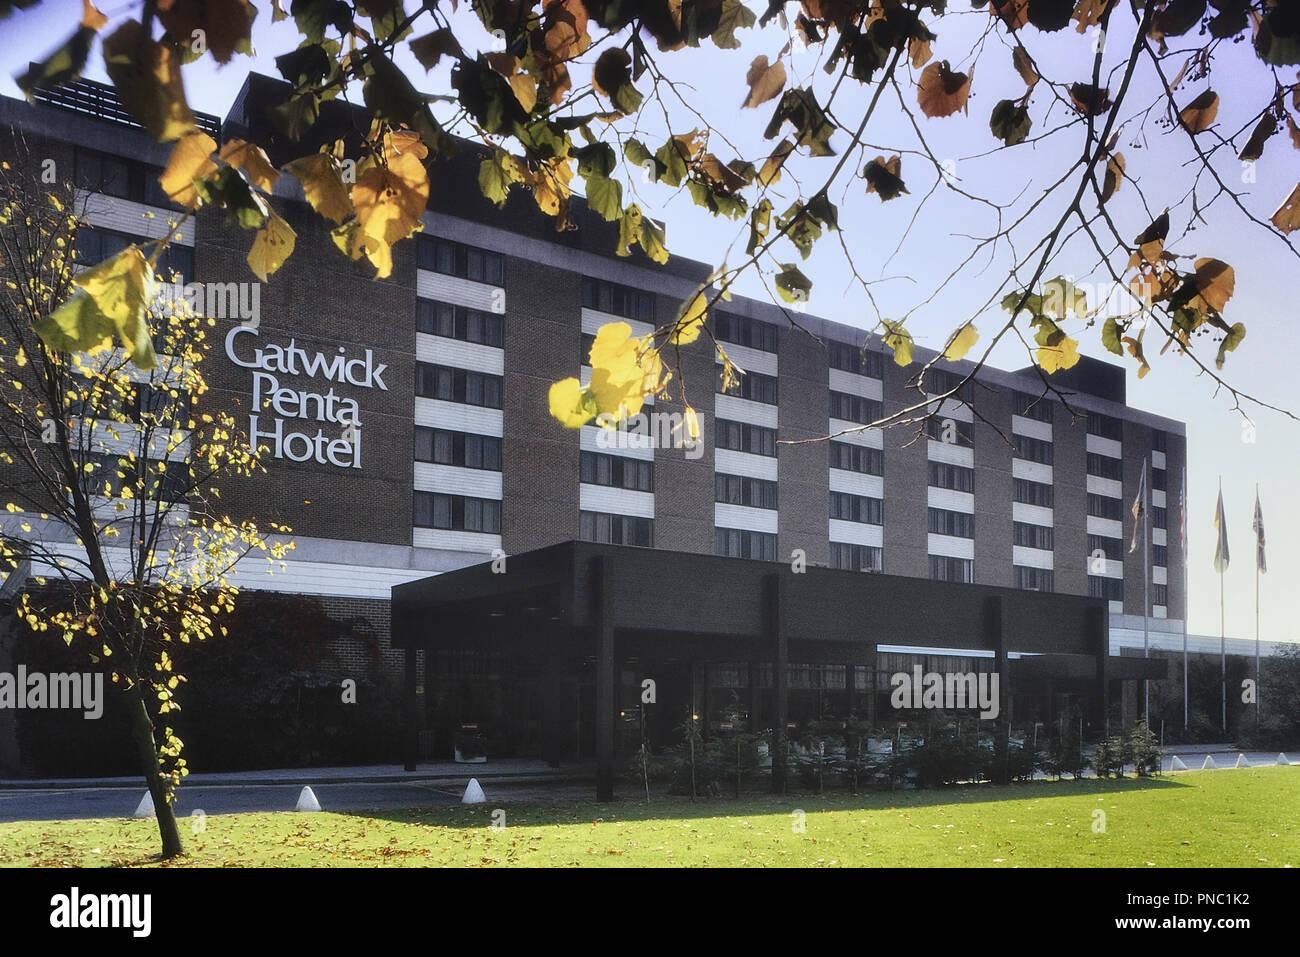 Gatwick Travelodge, formally The Gatwick Penta Hotel, Horley, England, UK. Circa 1980's - Stock Image